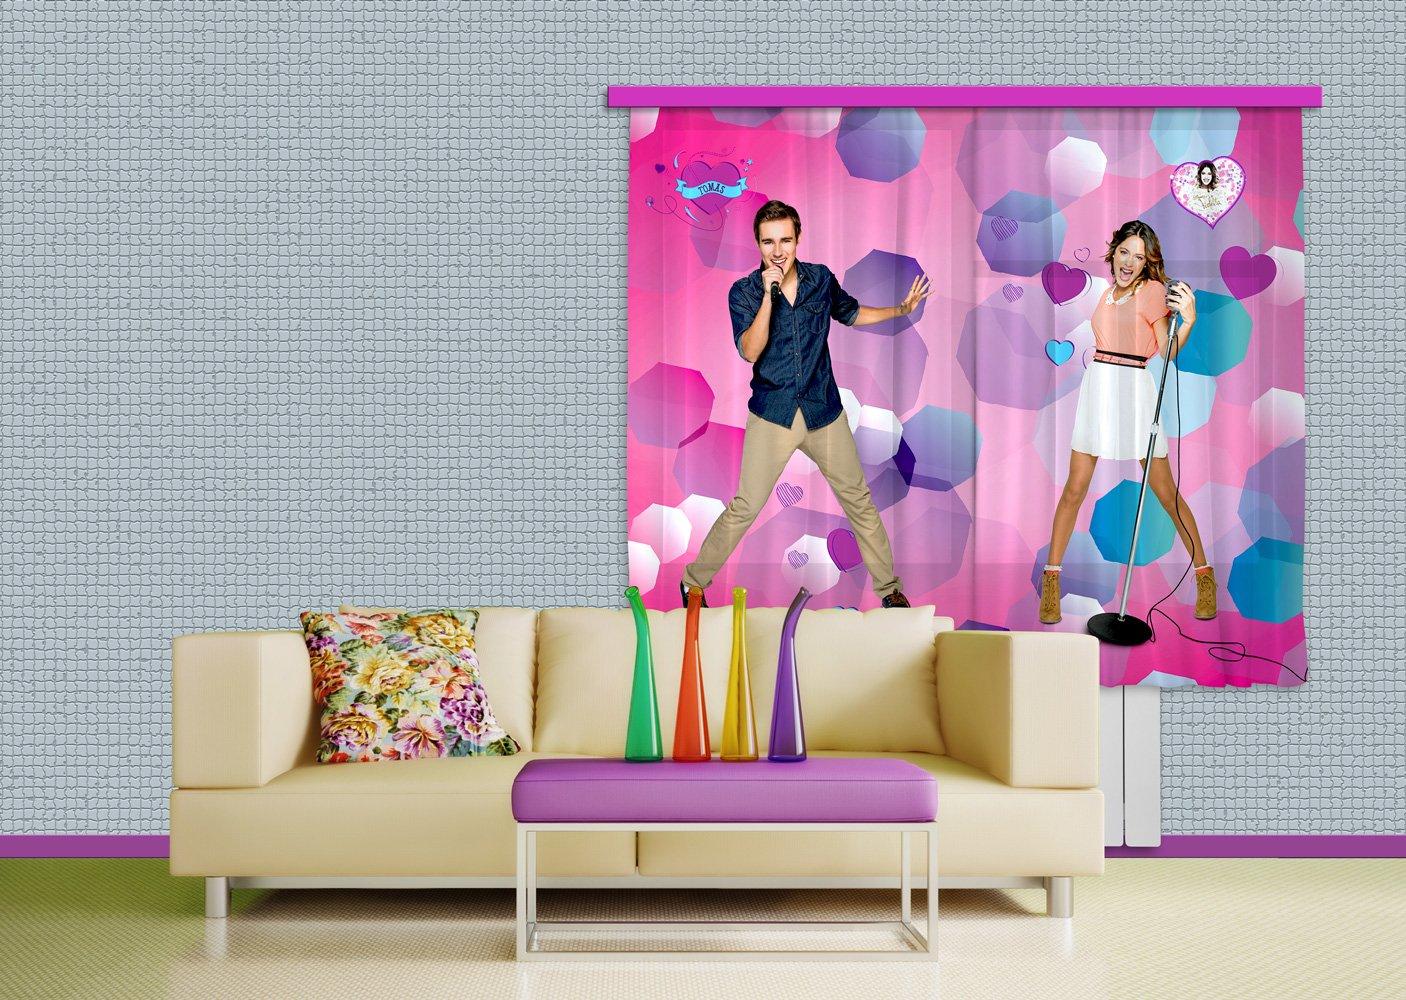 Camerette Disney Violetta : Ag design tenda fcs xl cameretta disney violetta amazon